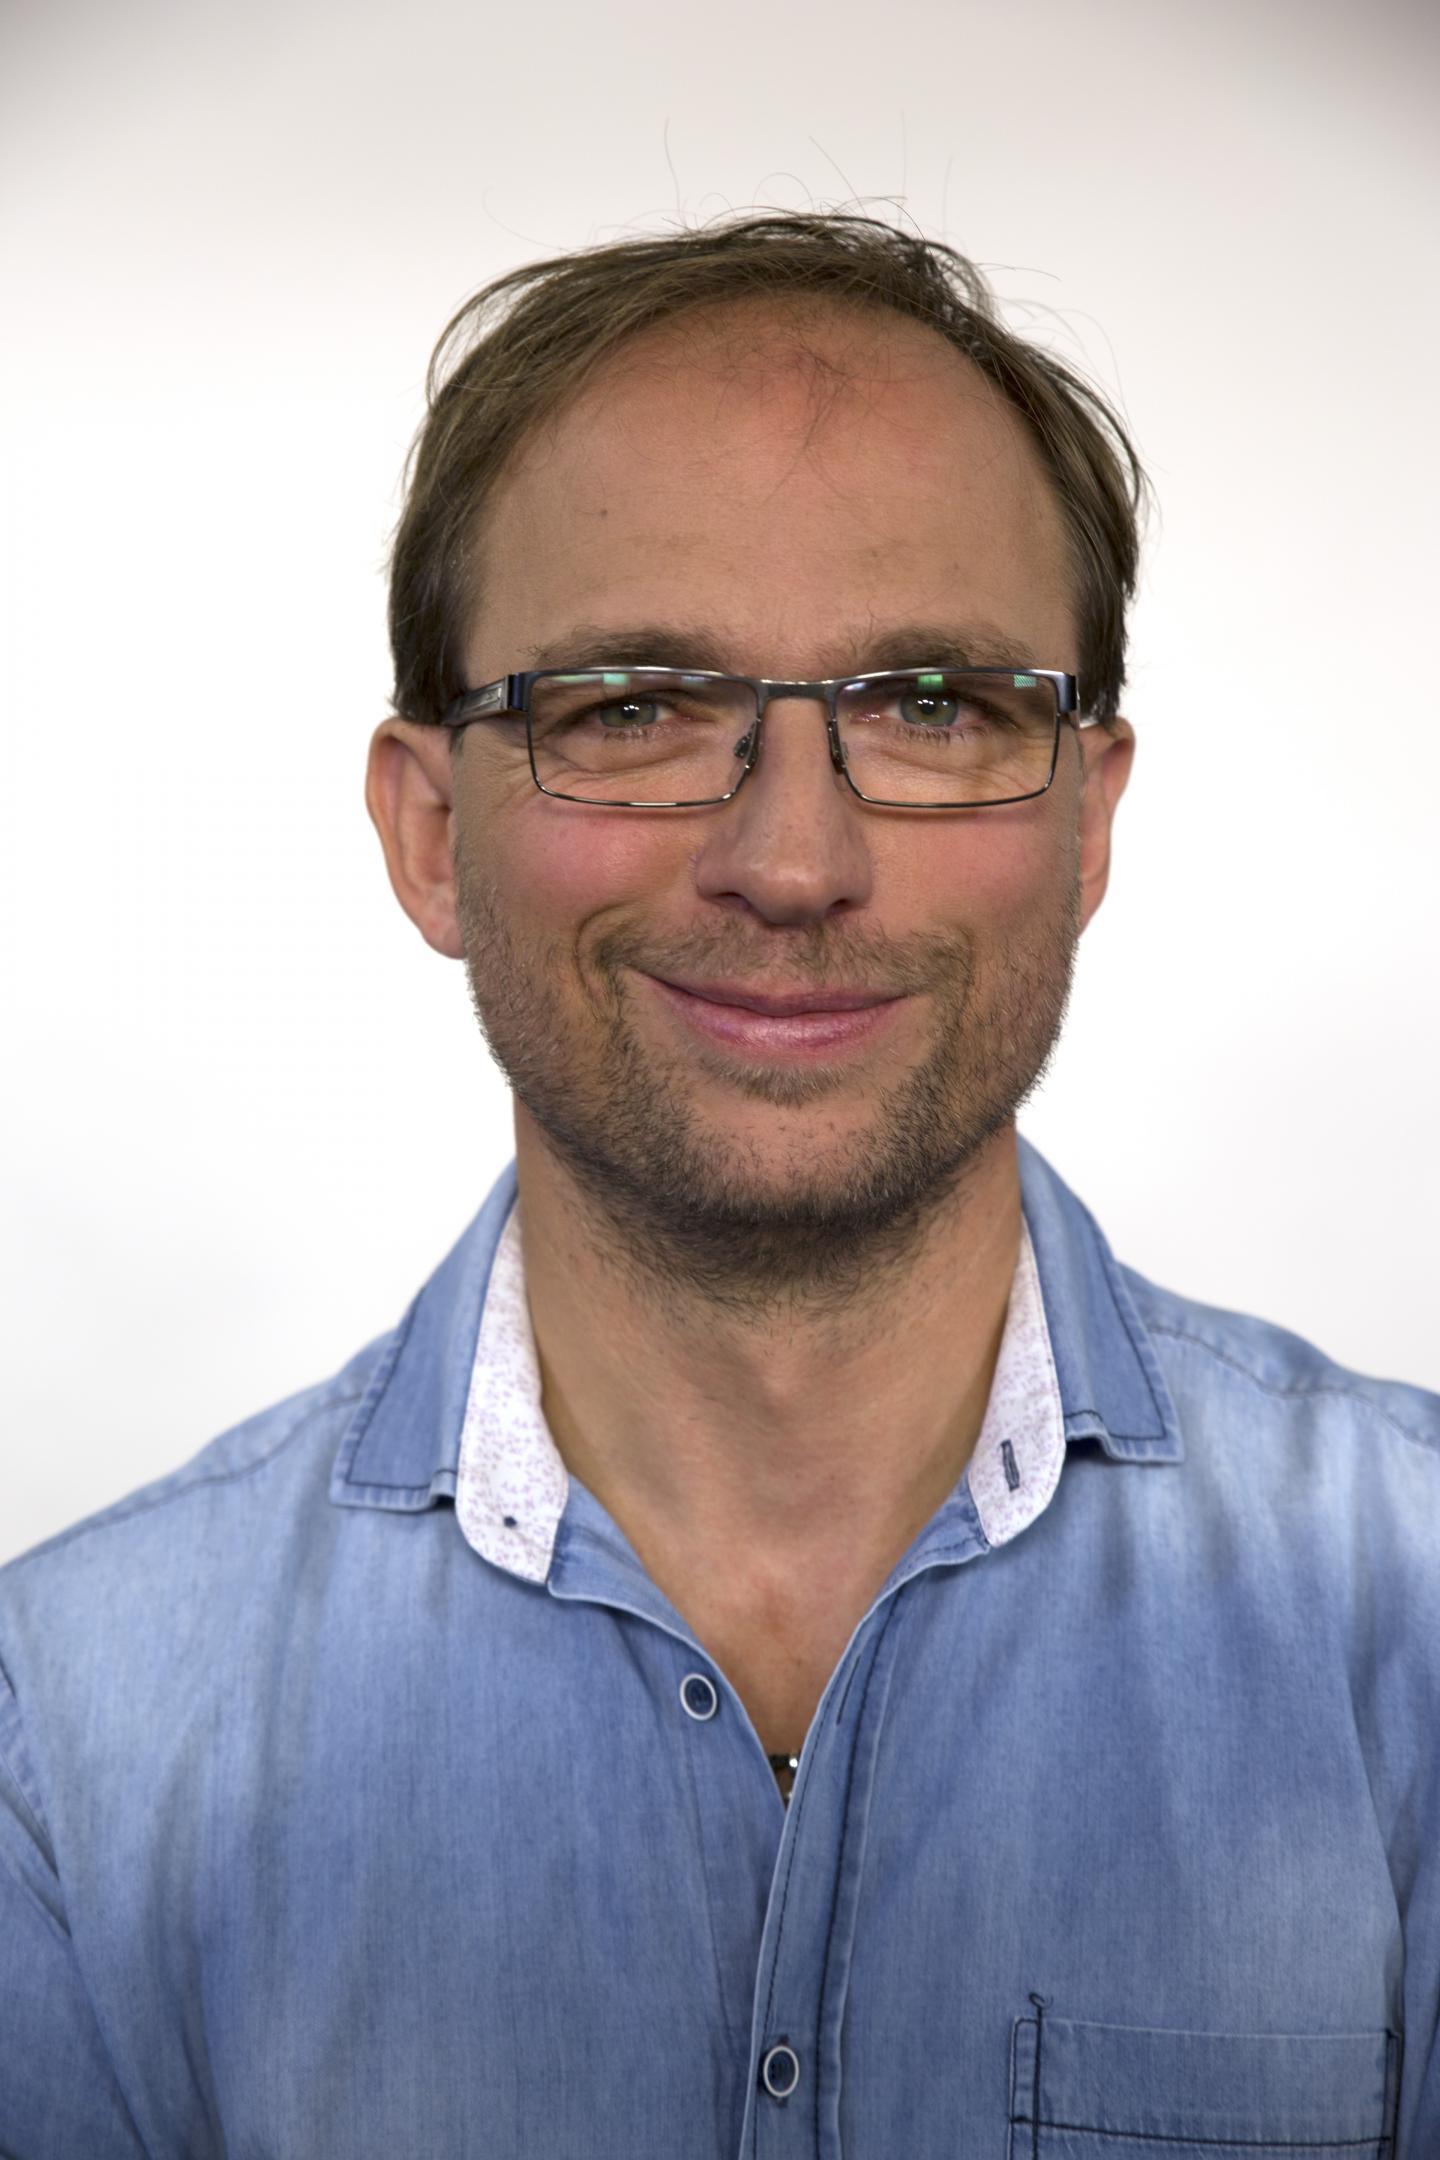 Gunnar Schulte, Karolinska Institutet